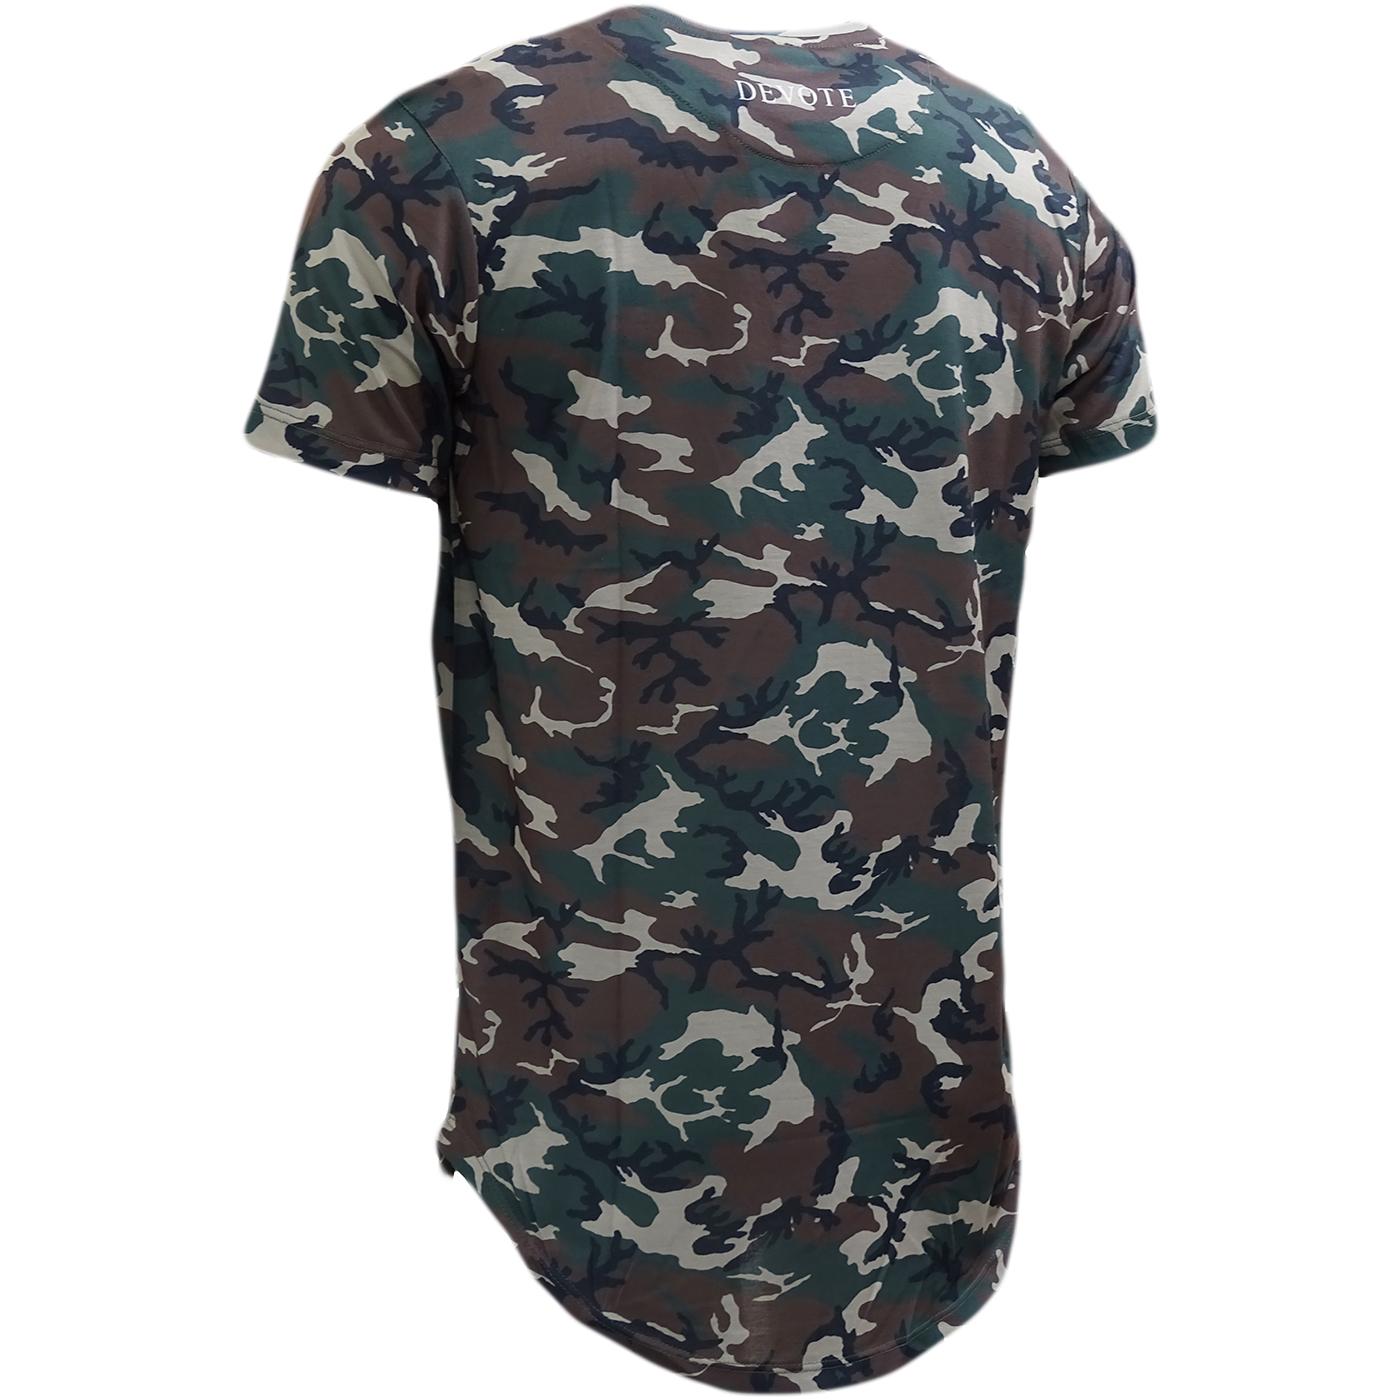 S M L XL XXL Mens Fashion T Shirt Devote T-Shirt